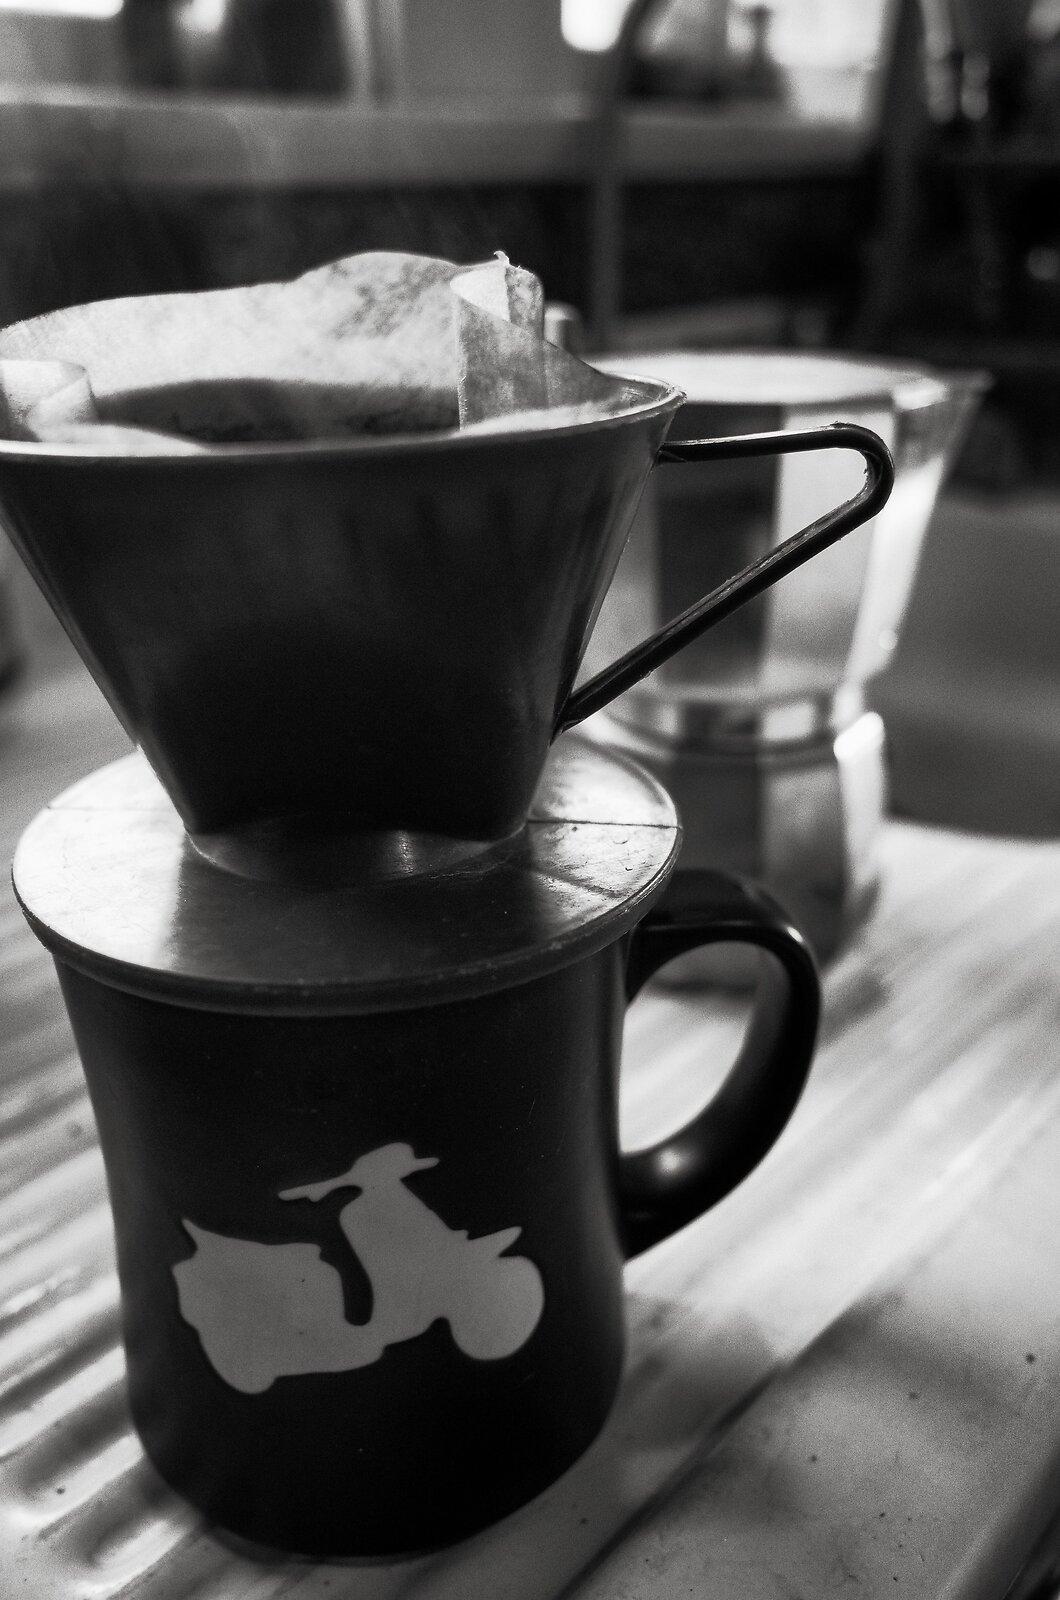 GRII_July8_Drip_Coffee(HiContrB&W).jpg